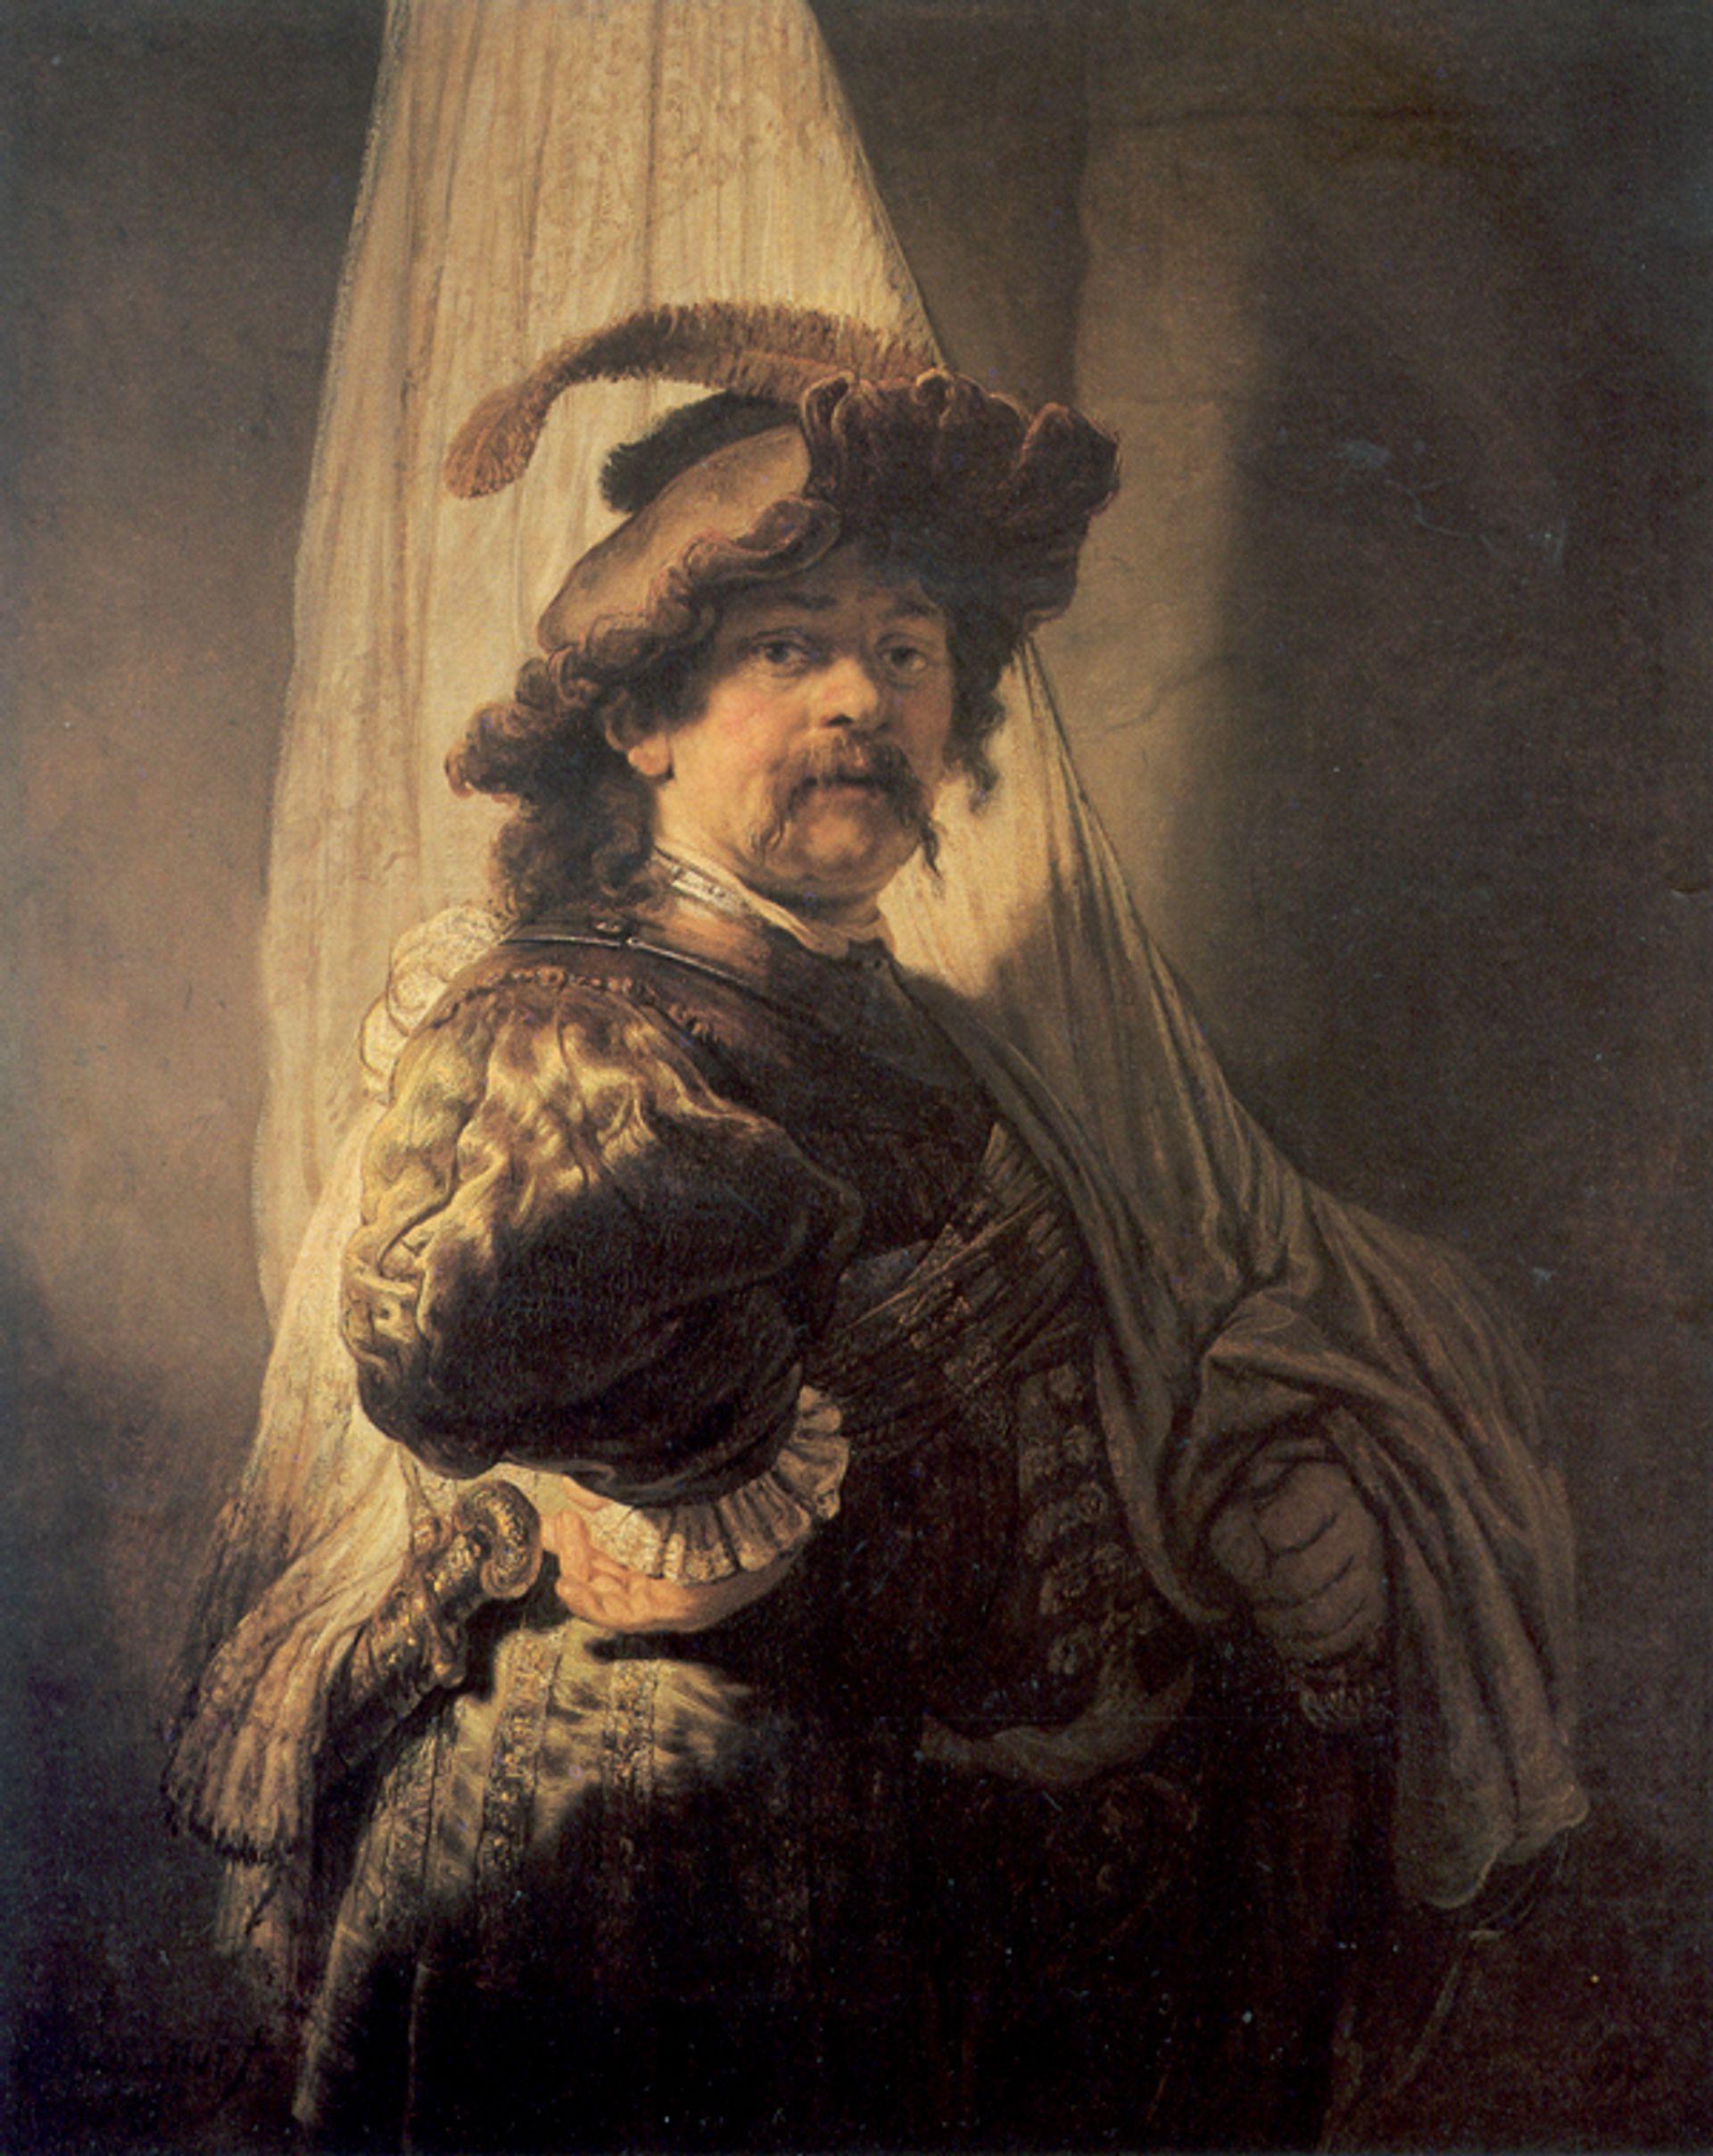 Rembrandt's The Standard Bearer (1636) Image via Wikicommons